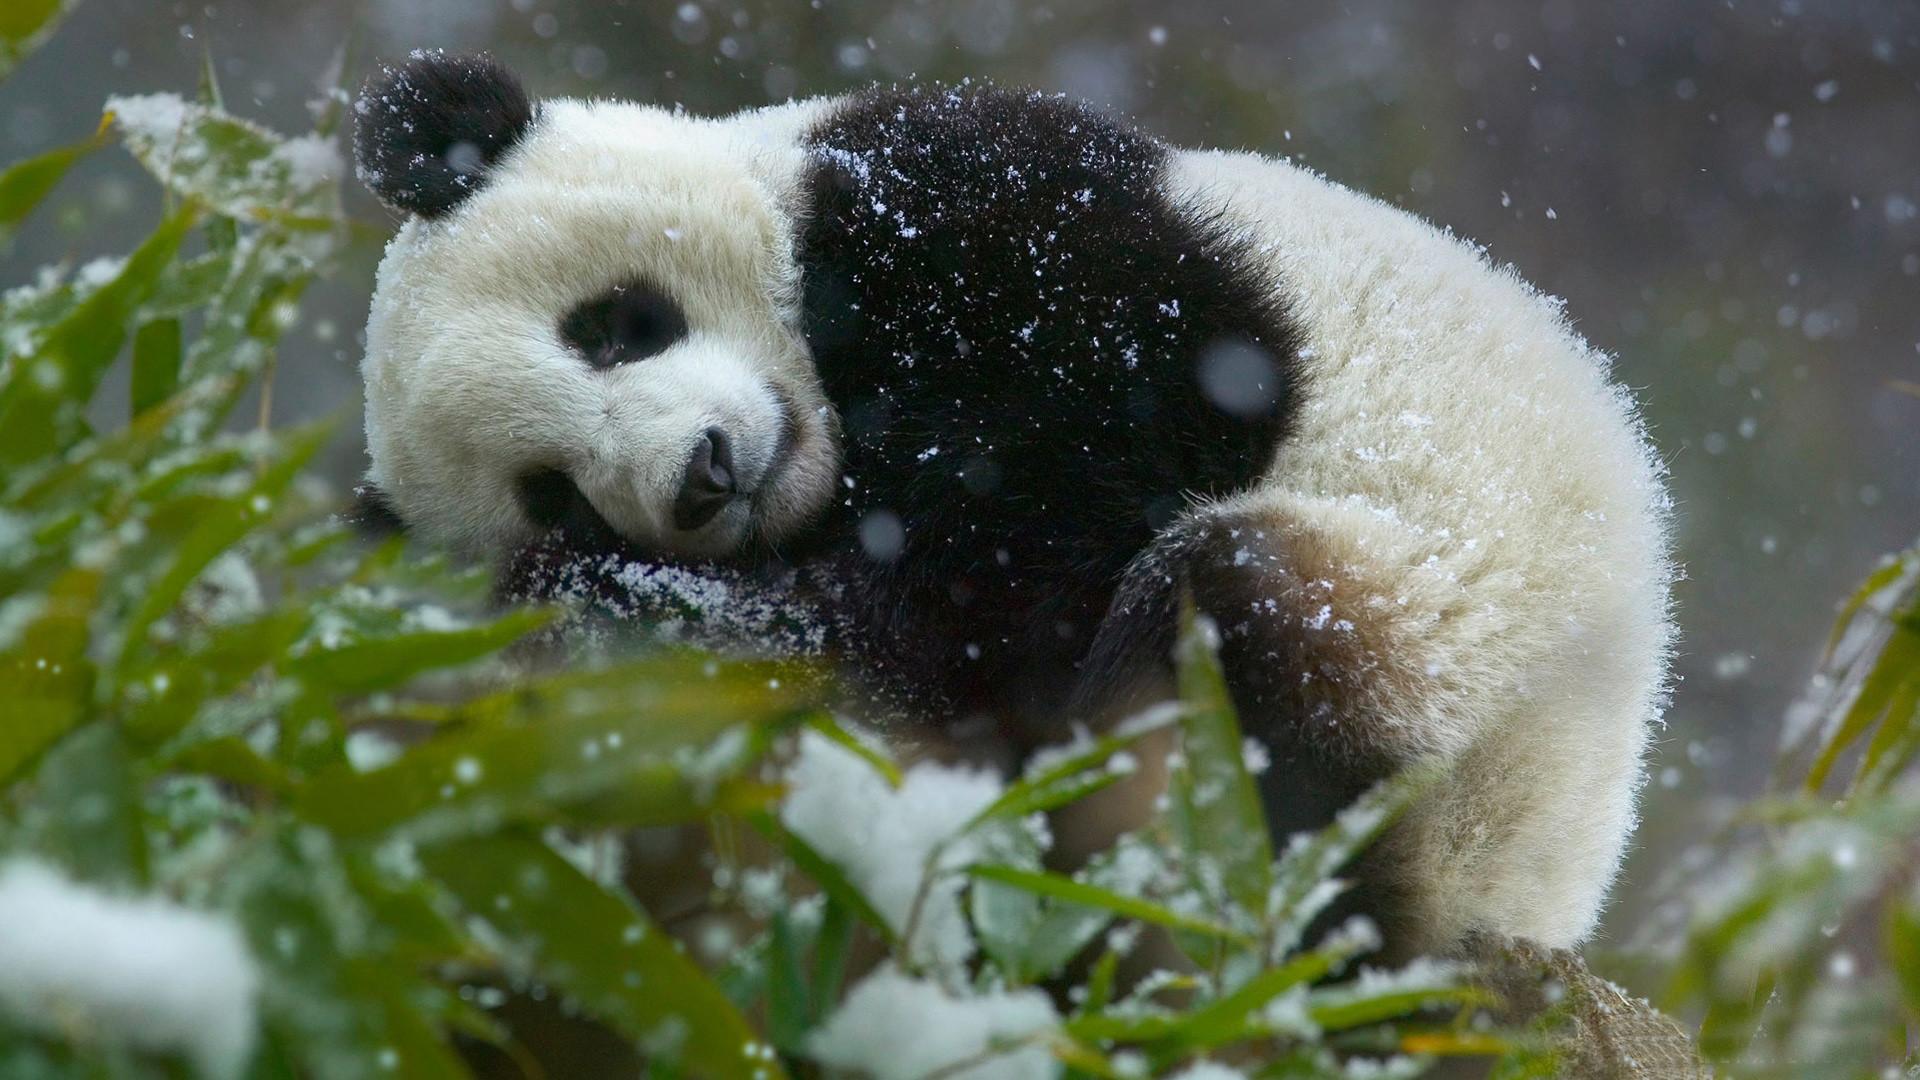 Panda Bear Wallpaper – JnsrmgkSB i-Journal